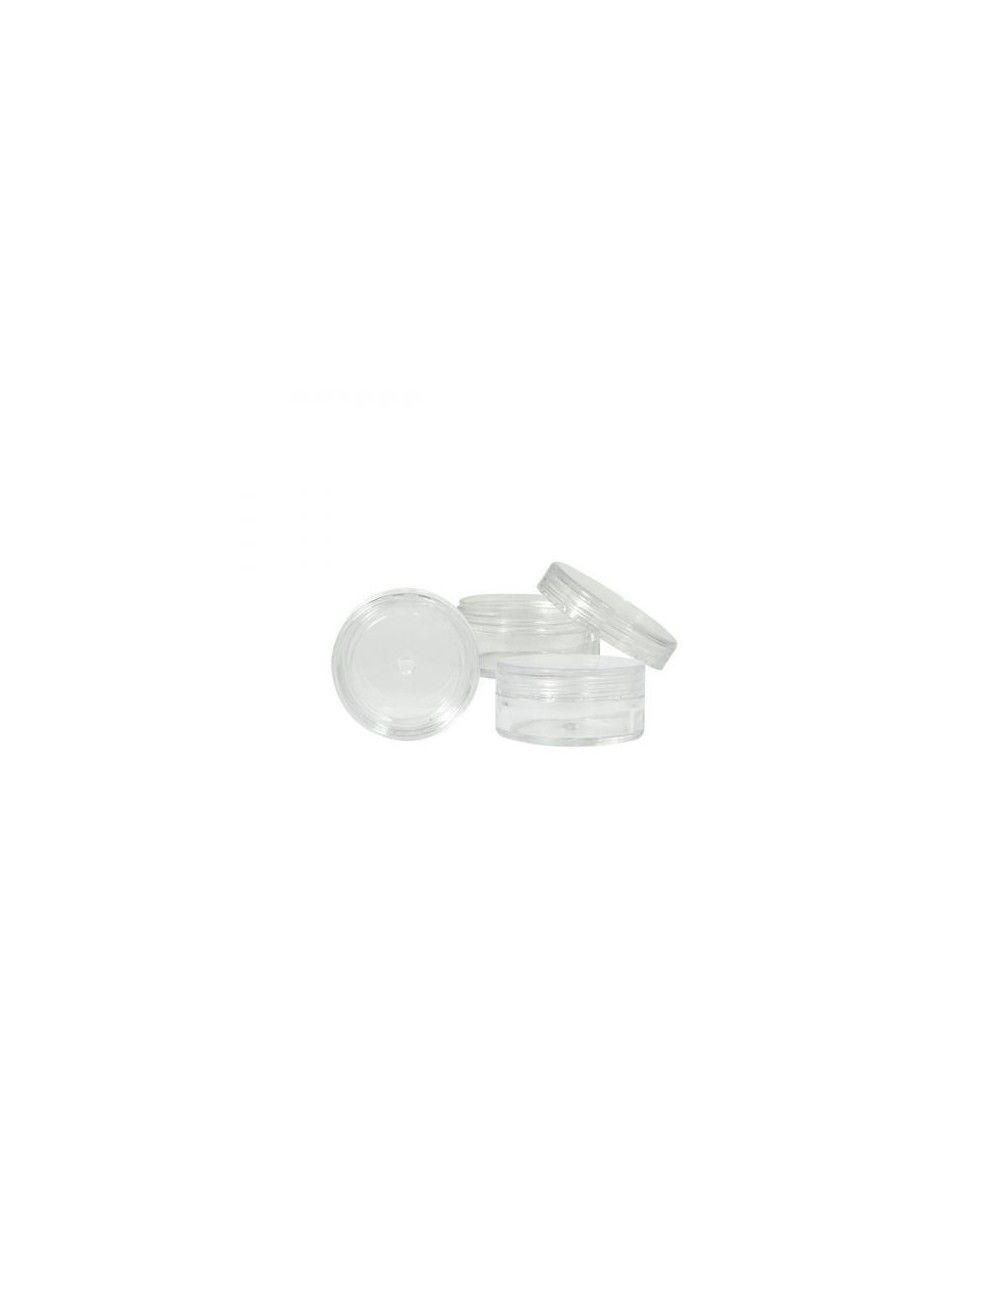 Acrylic Container - 5 ml